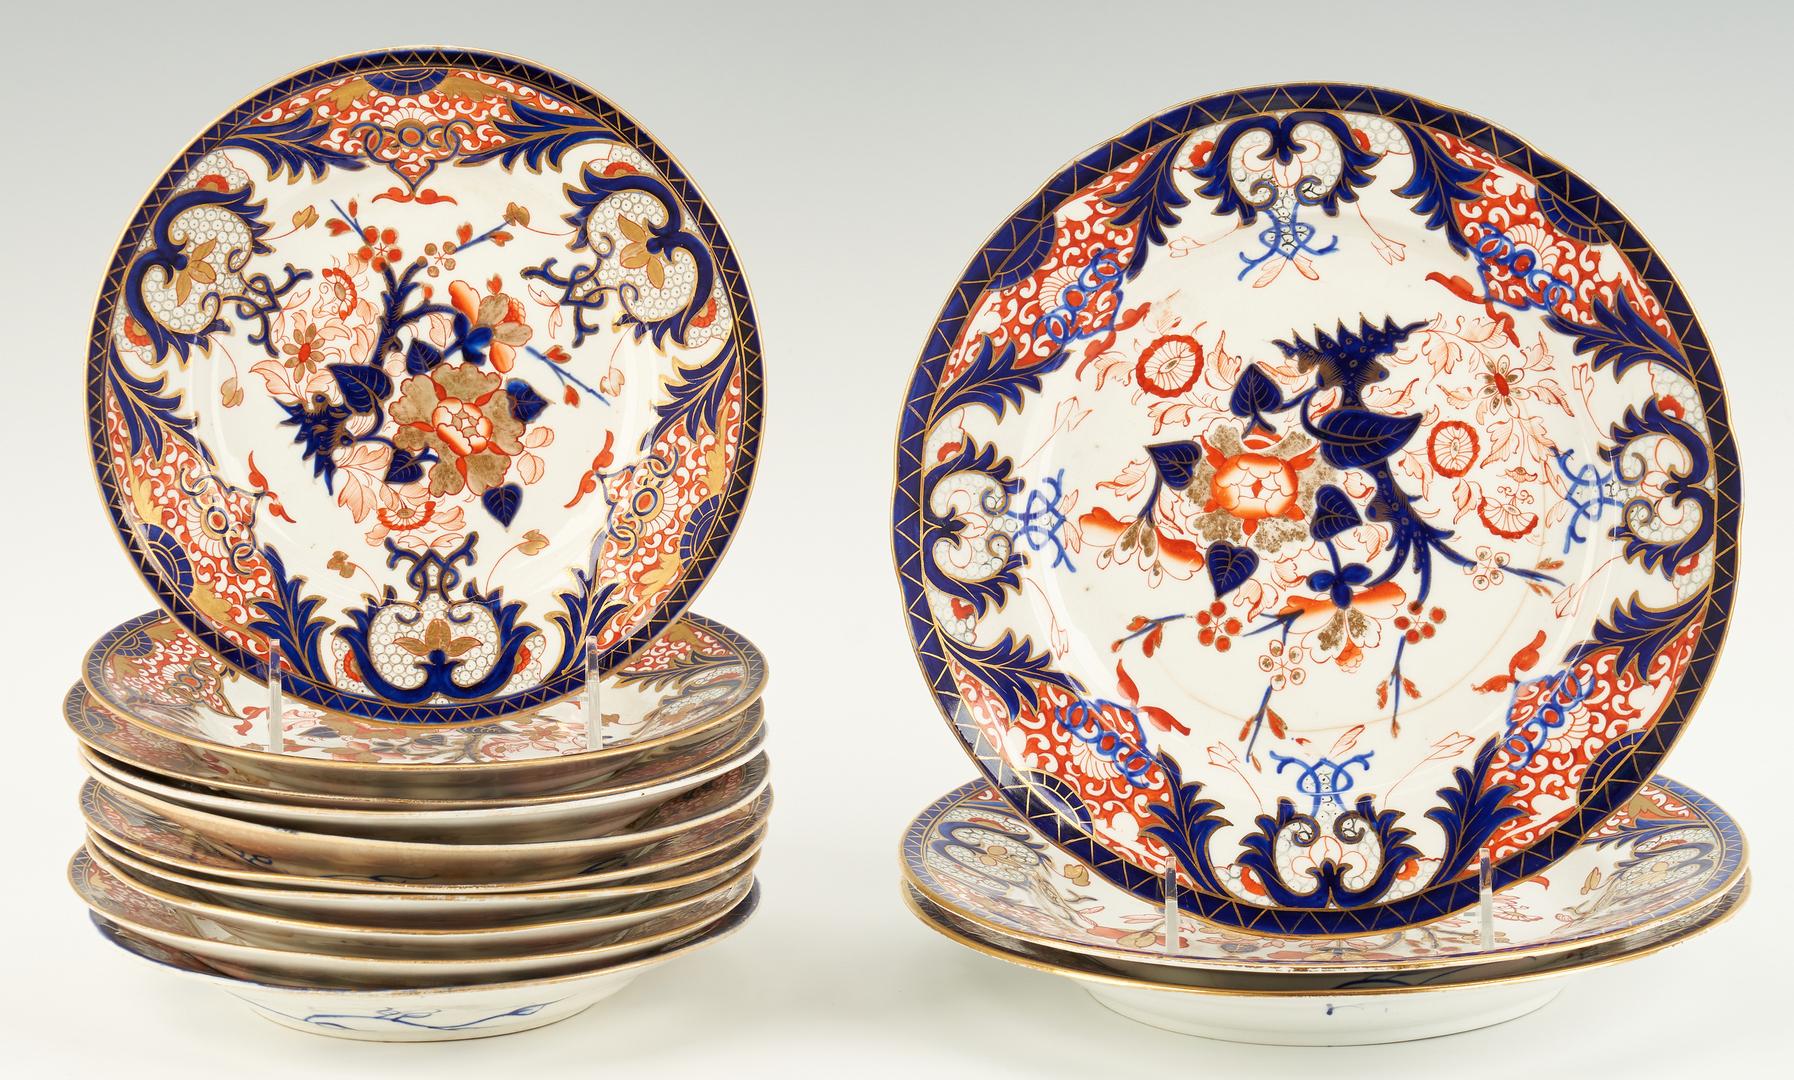 Lot 305: 58 Pcs. Royal Crown Derby Kings Pattern Porcelain Dinnerware